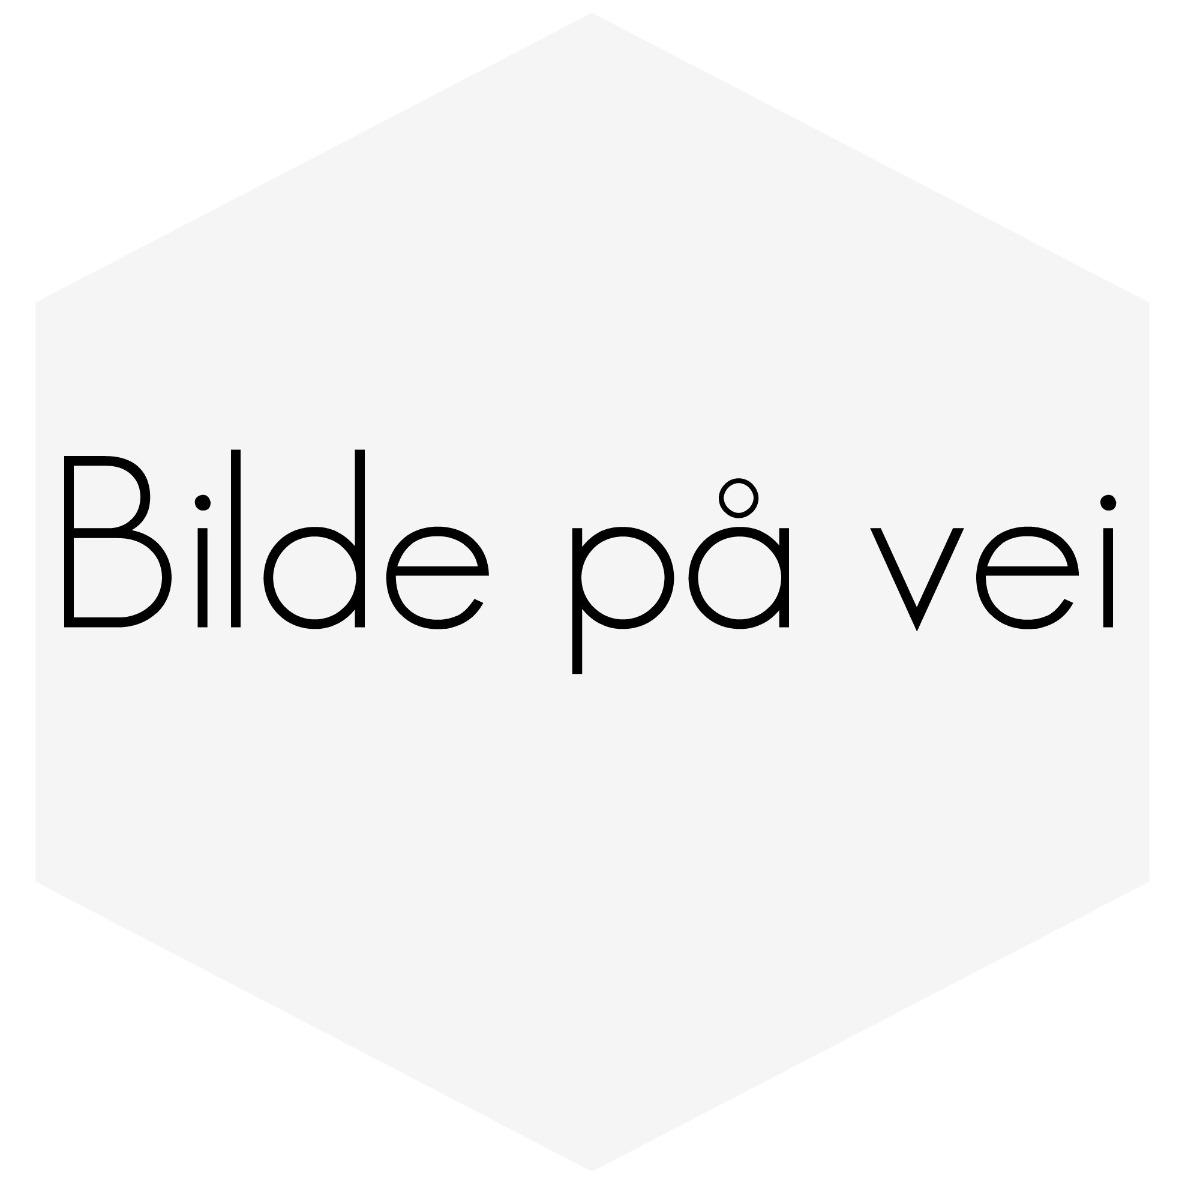 PUMPE TIL DRIVSTOFF PÅ TILLEGSVARMER SE INFO